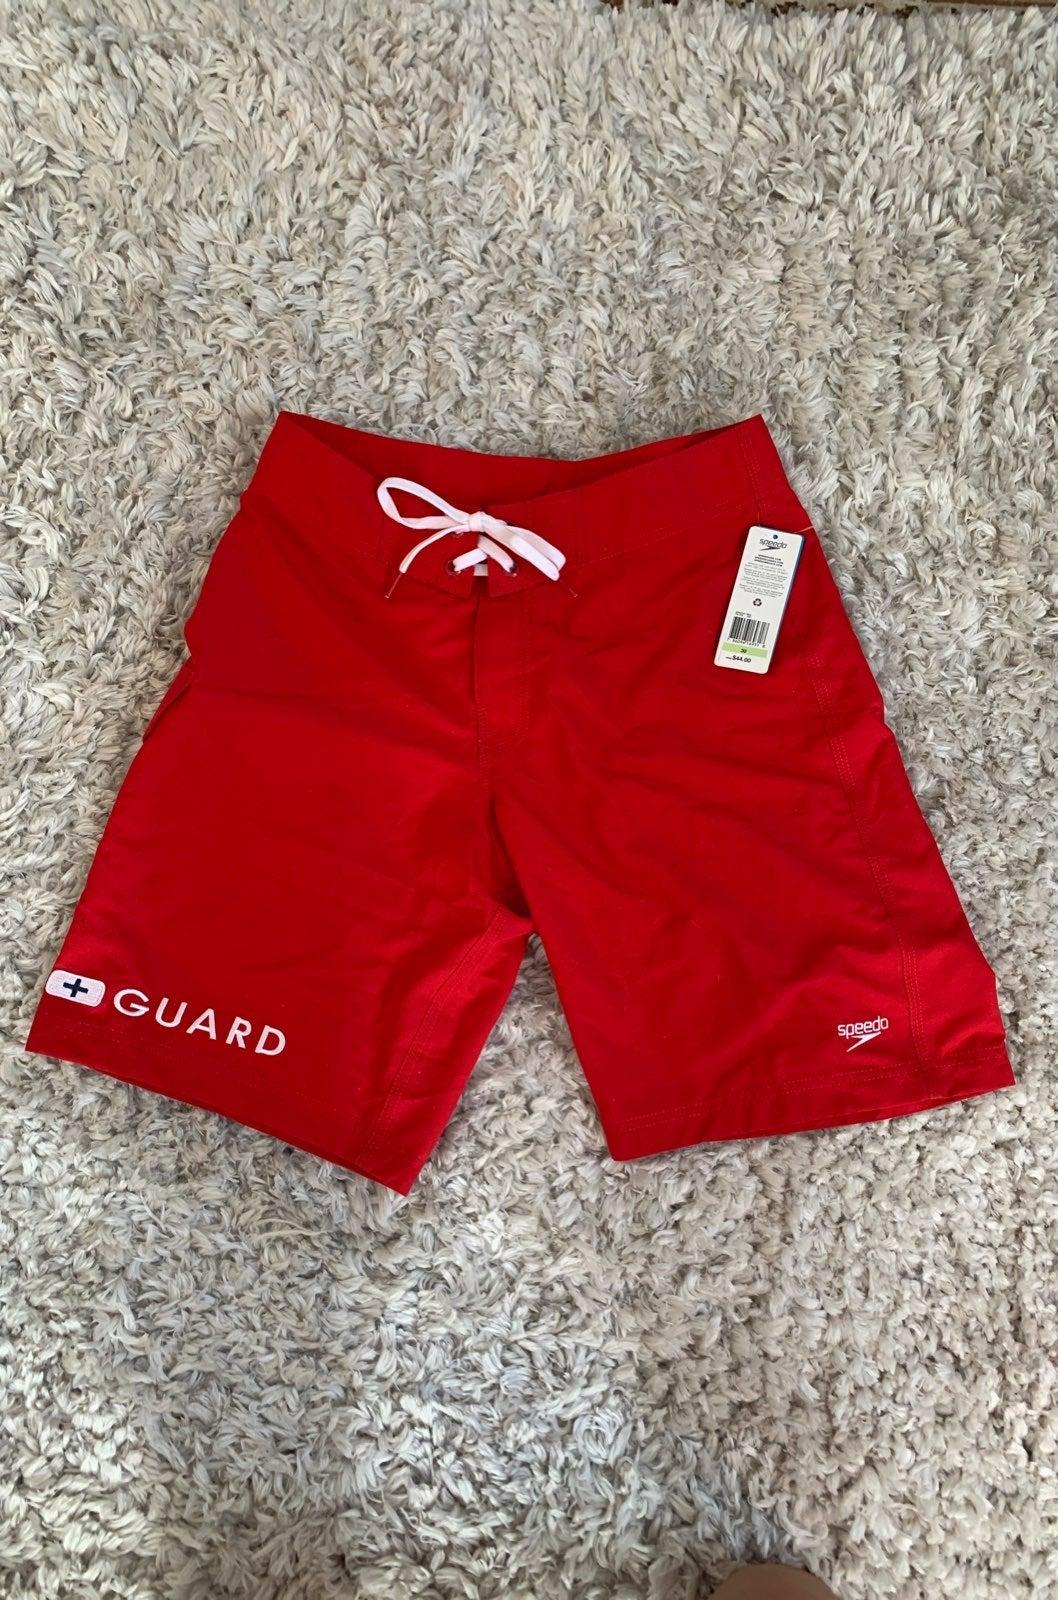 Speedo men's lifeguard swimsuit